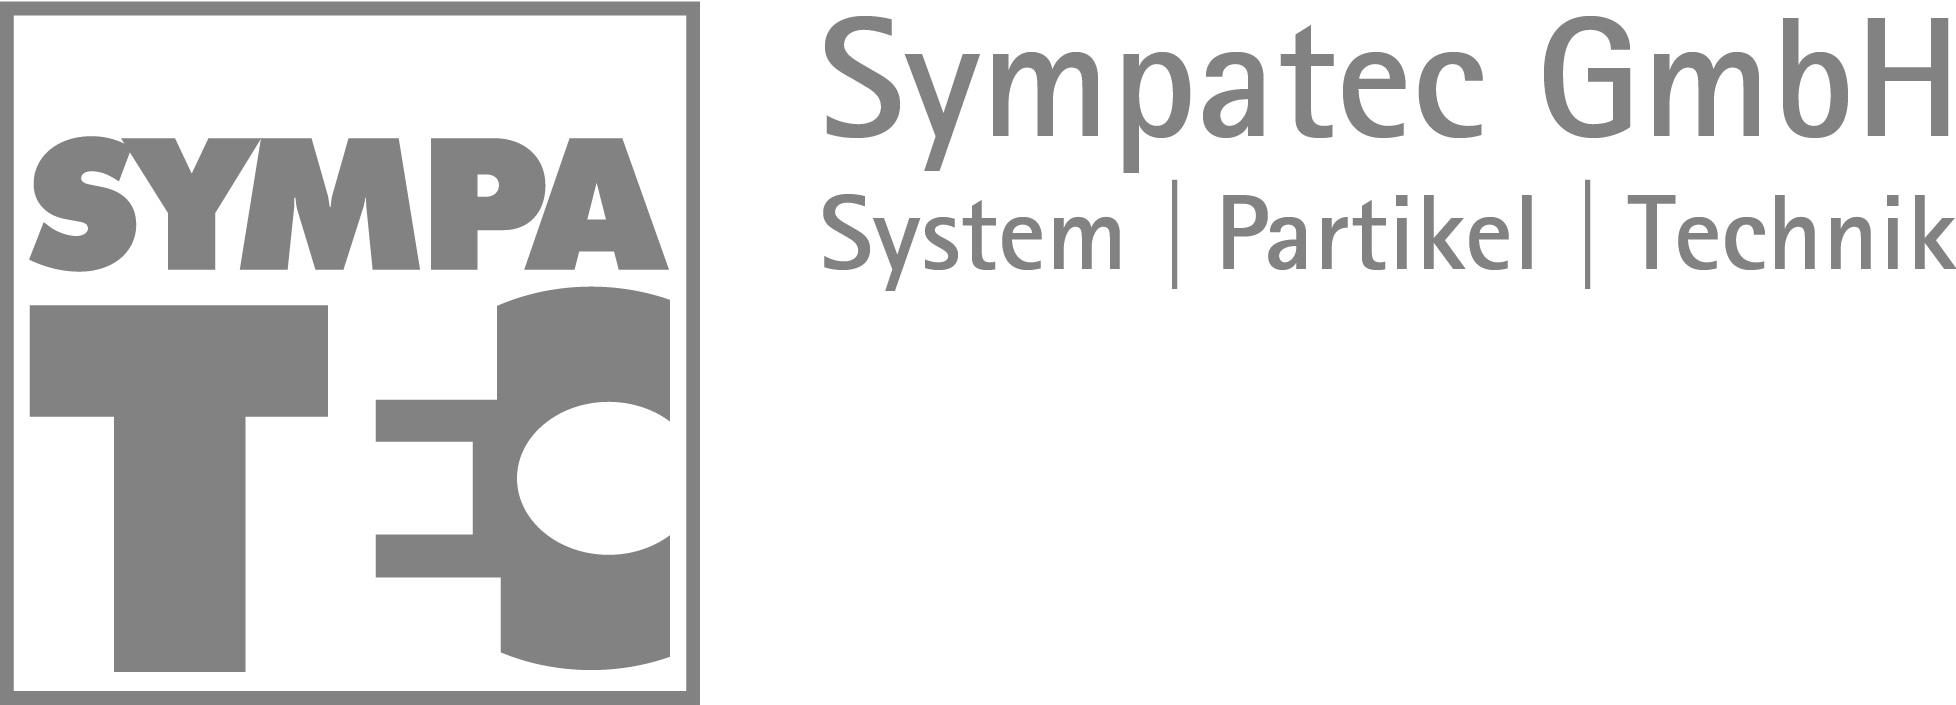 Sympatec GmbH logo.